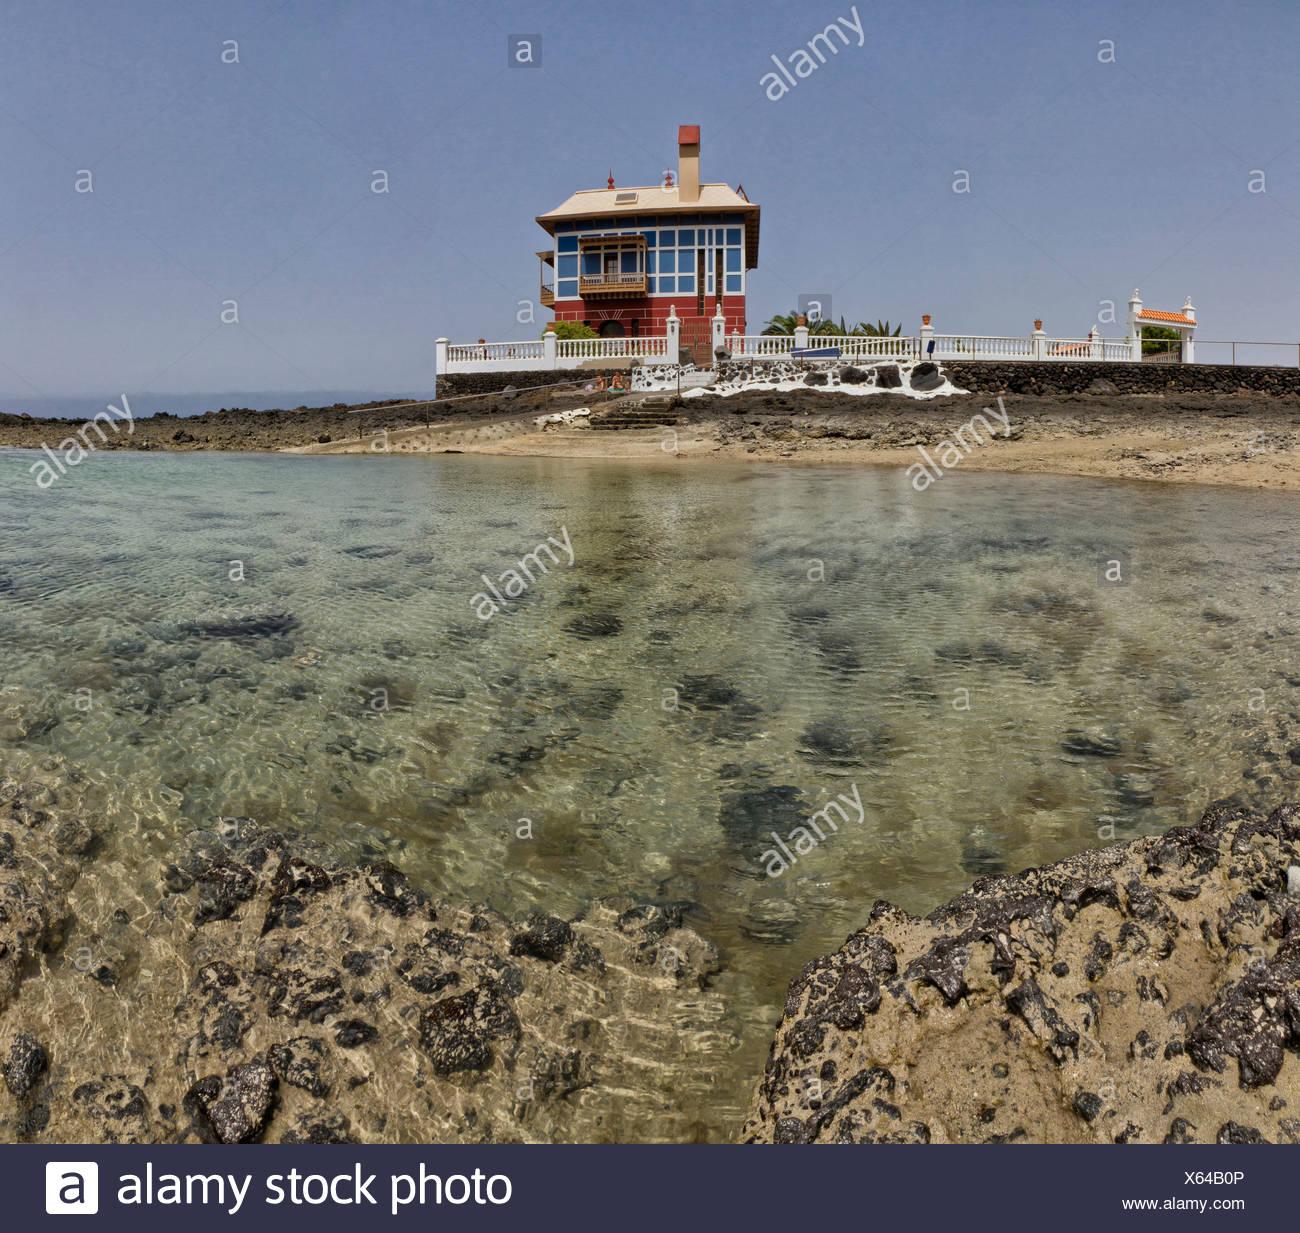 España, Lanzarote, Arrieta, Casa Azul, casa, agua, Verano, playa, mar, Islas Canarias Imagen De Stock